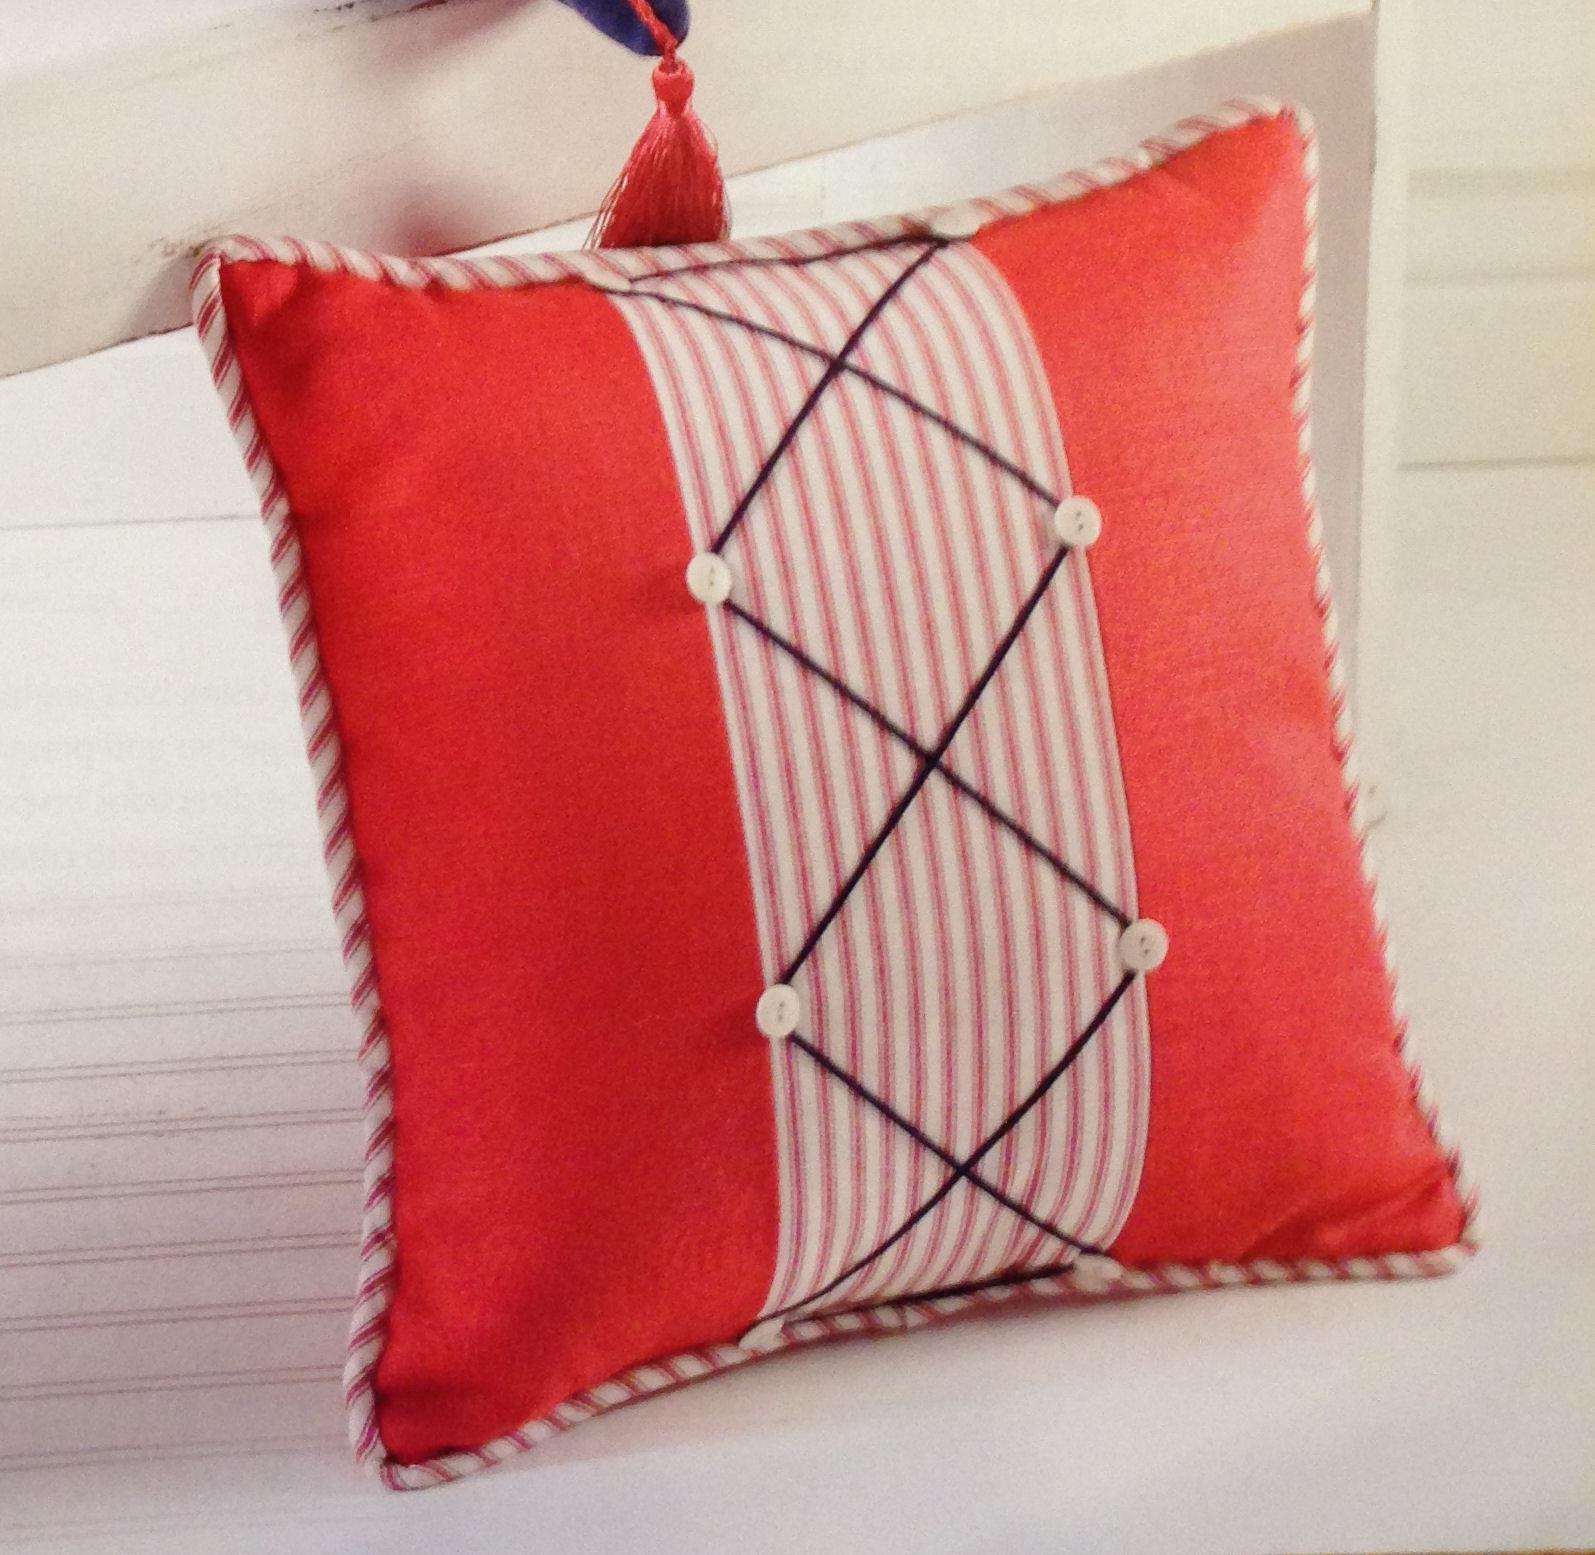 Book giveaway sew easy designer pillows judy nolan